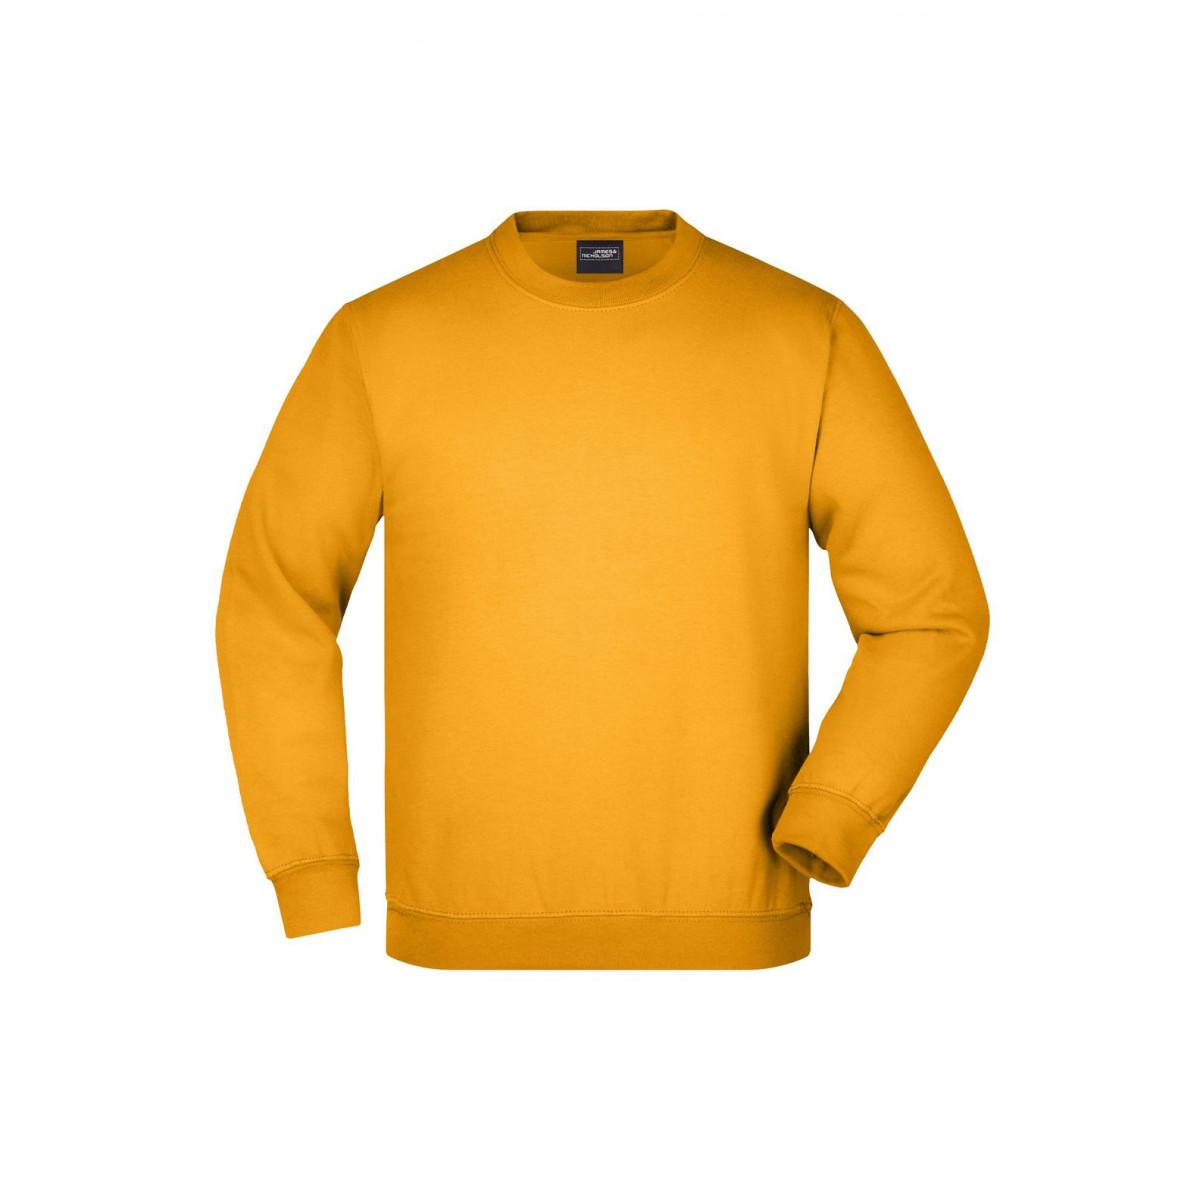 Толстовка детская JN040K Round Sweat Heavy Junior - Золоистый желтый